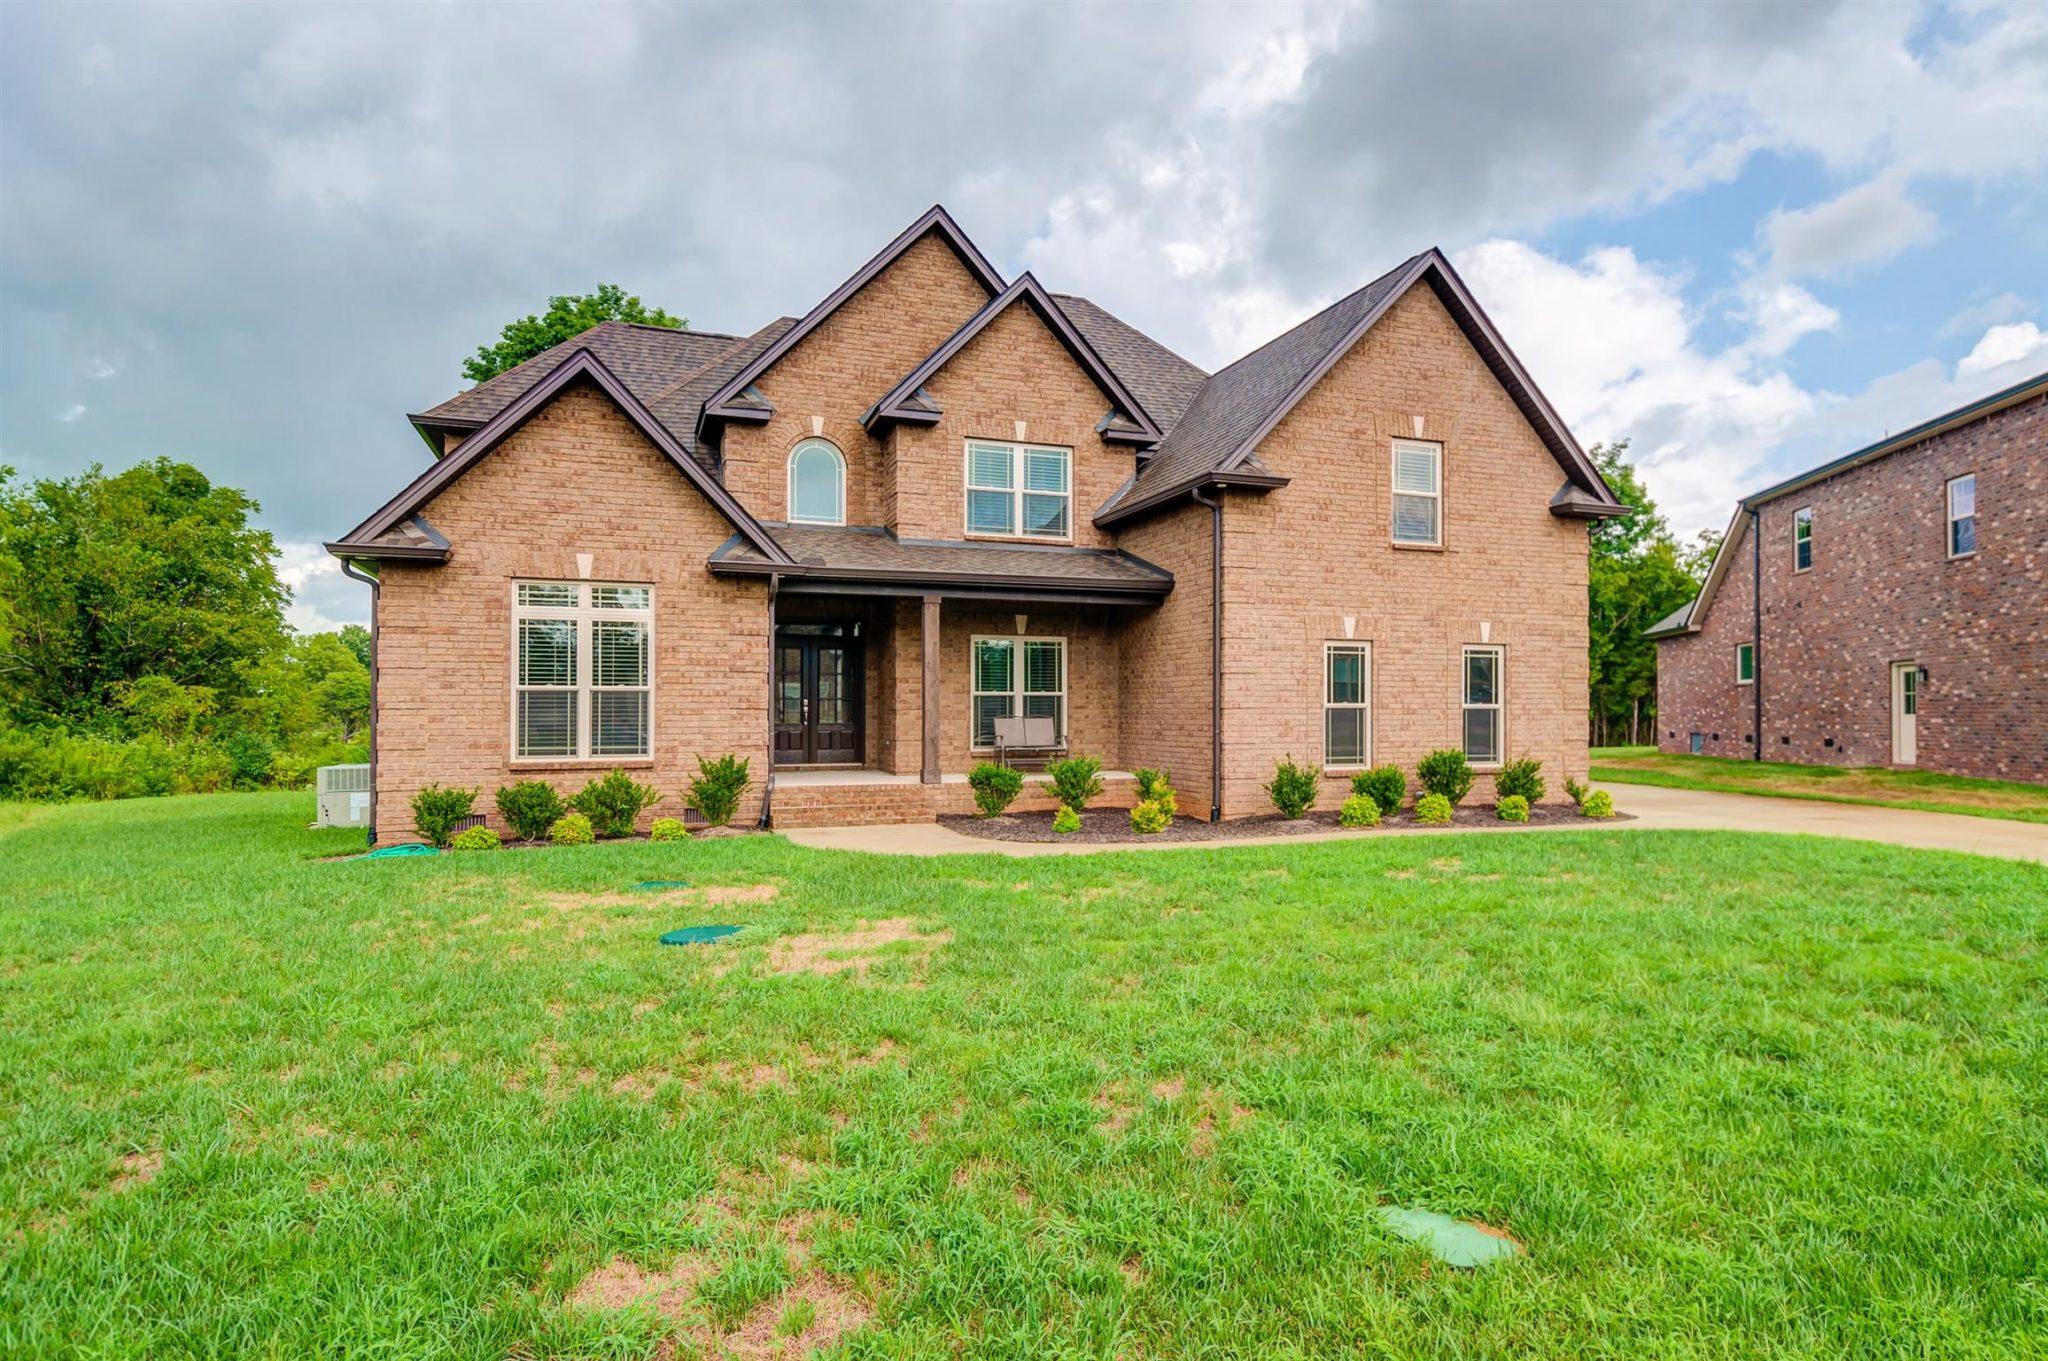 Houses For Sale In Murfreesboro Tn